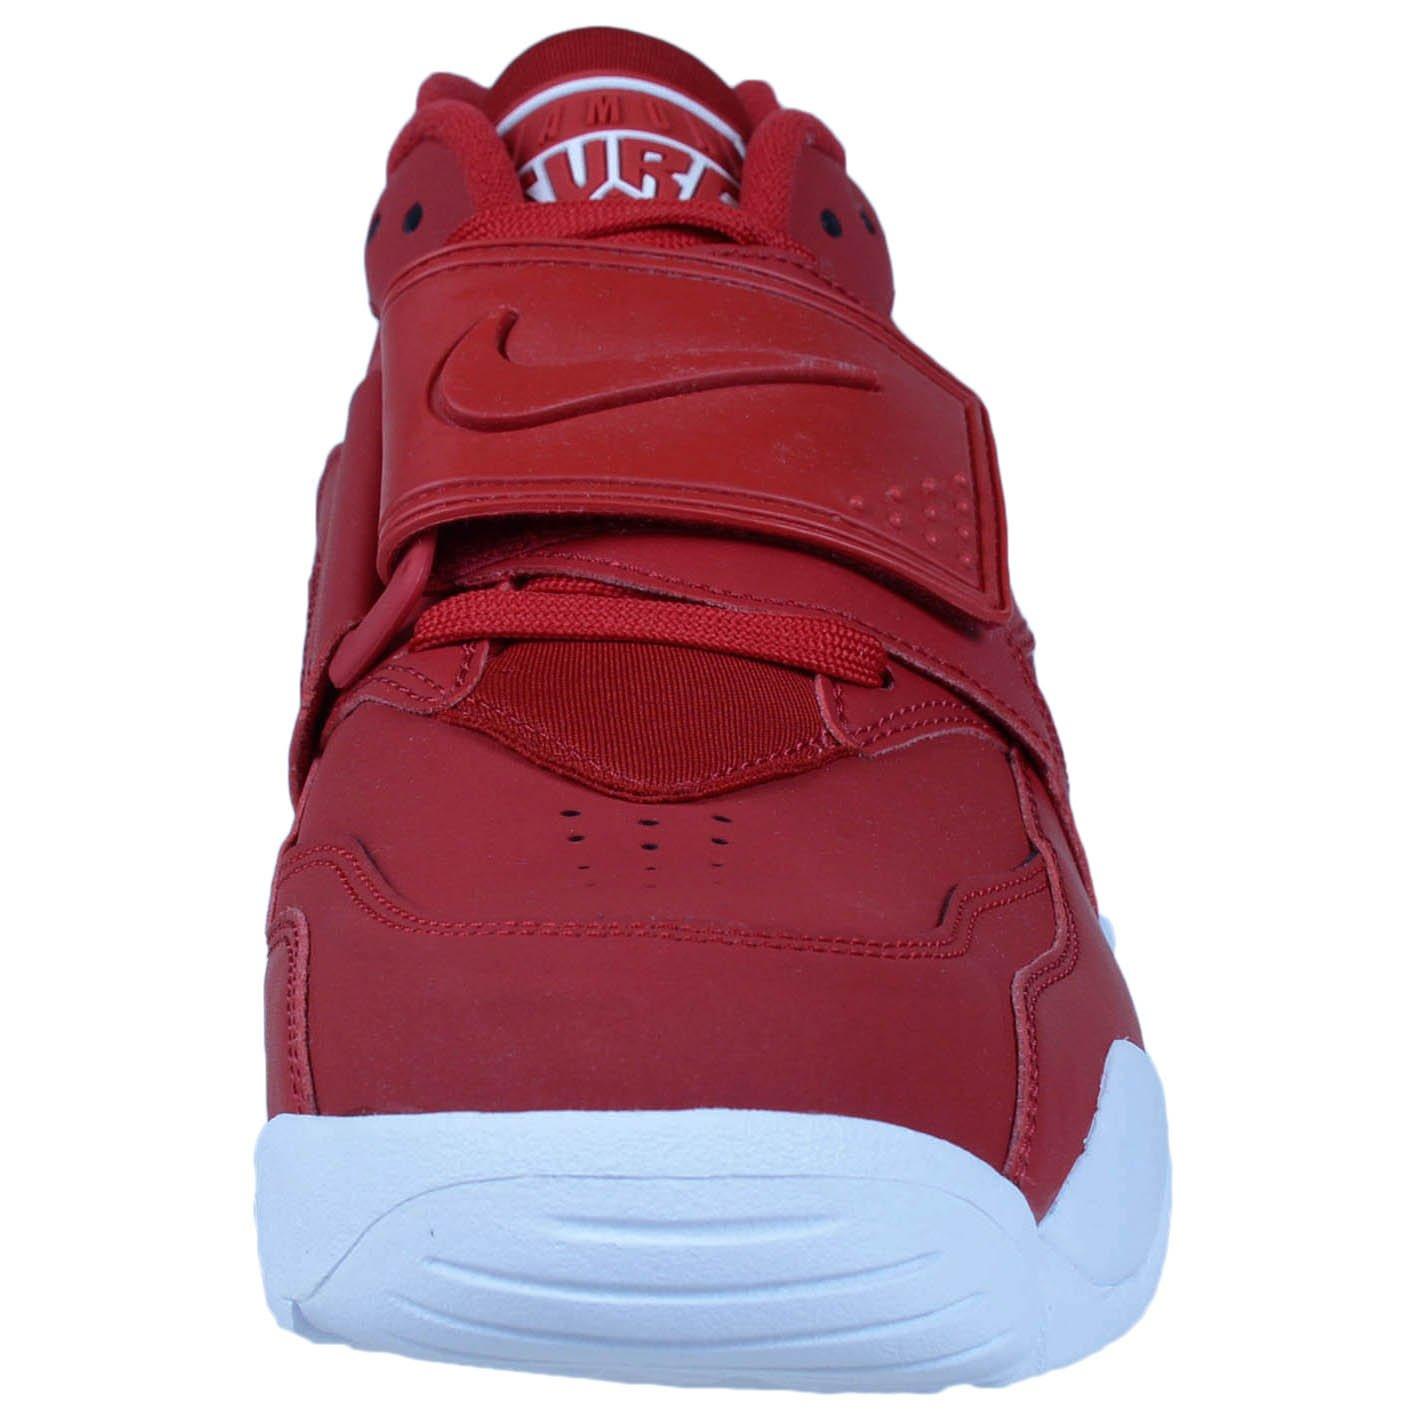 outlet store 447b1 25b9a Amazon.com   Nike AIR DIAMOND TURF Mens Sneakers 309434-600   Basketball